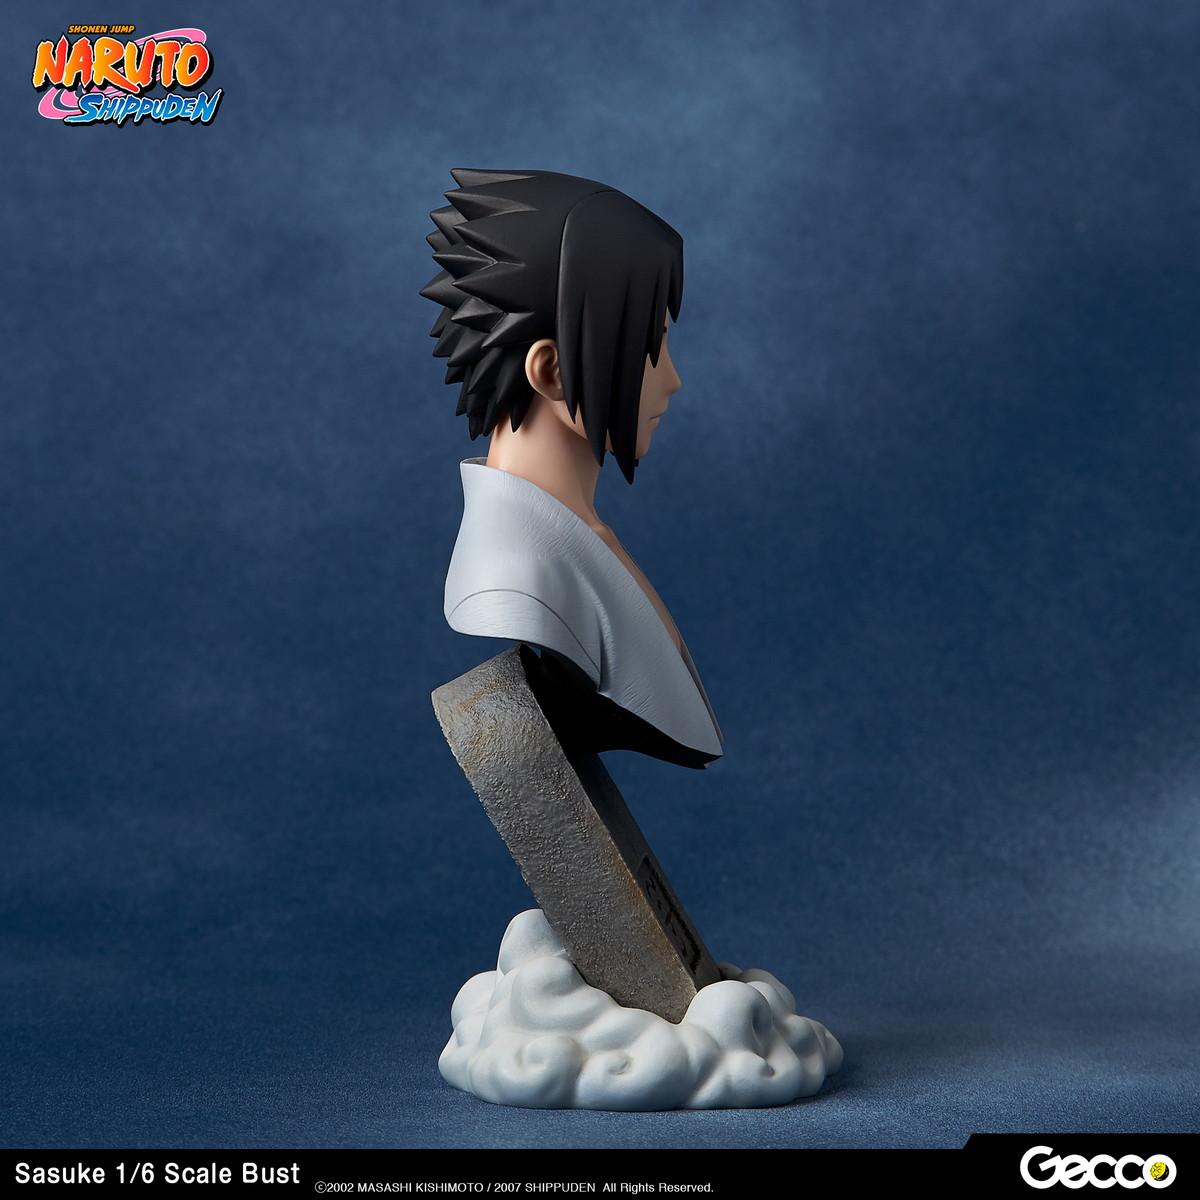 Sasuke Uchiha Naruto Shippuden Bust Figure